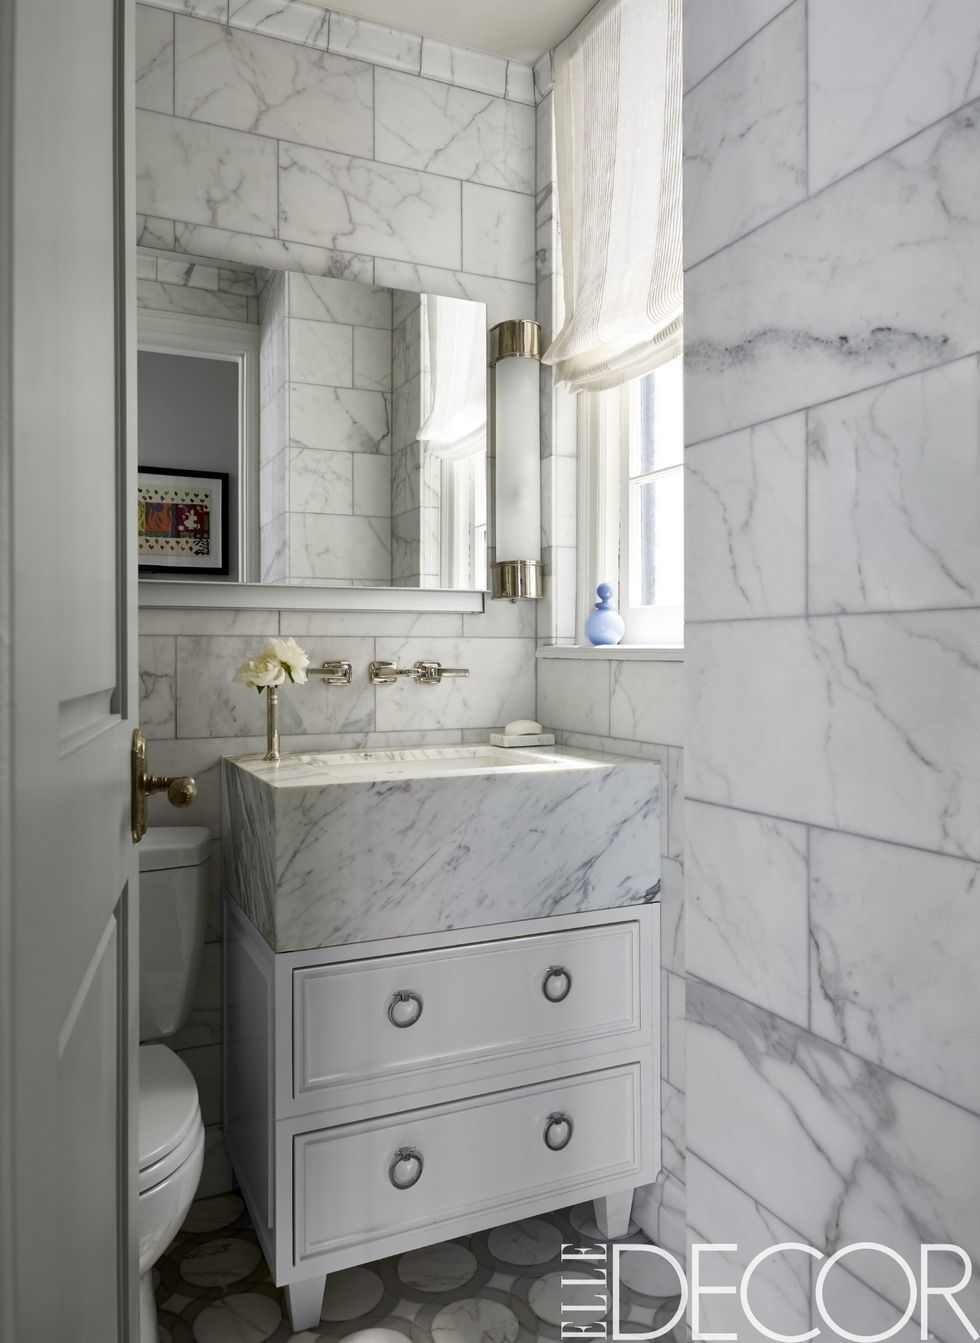 25 white bathroom design ideas decorating tips for all white bathrooms rh elledecor com white bathroom designs pictures white bedroom designs